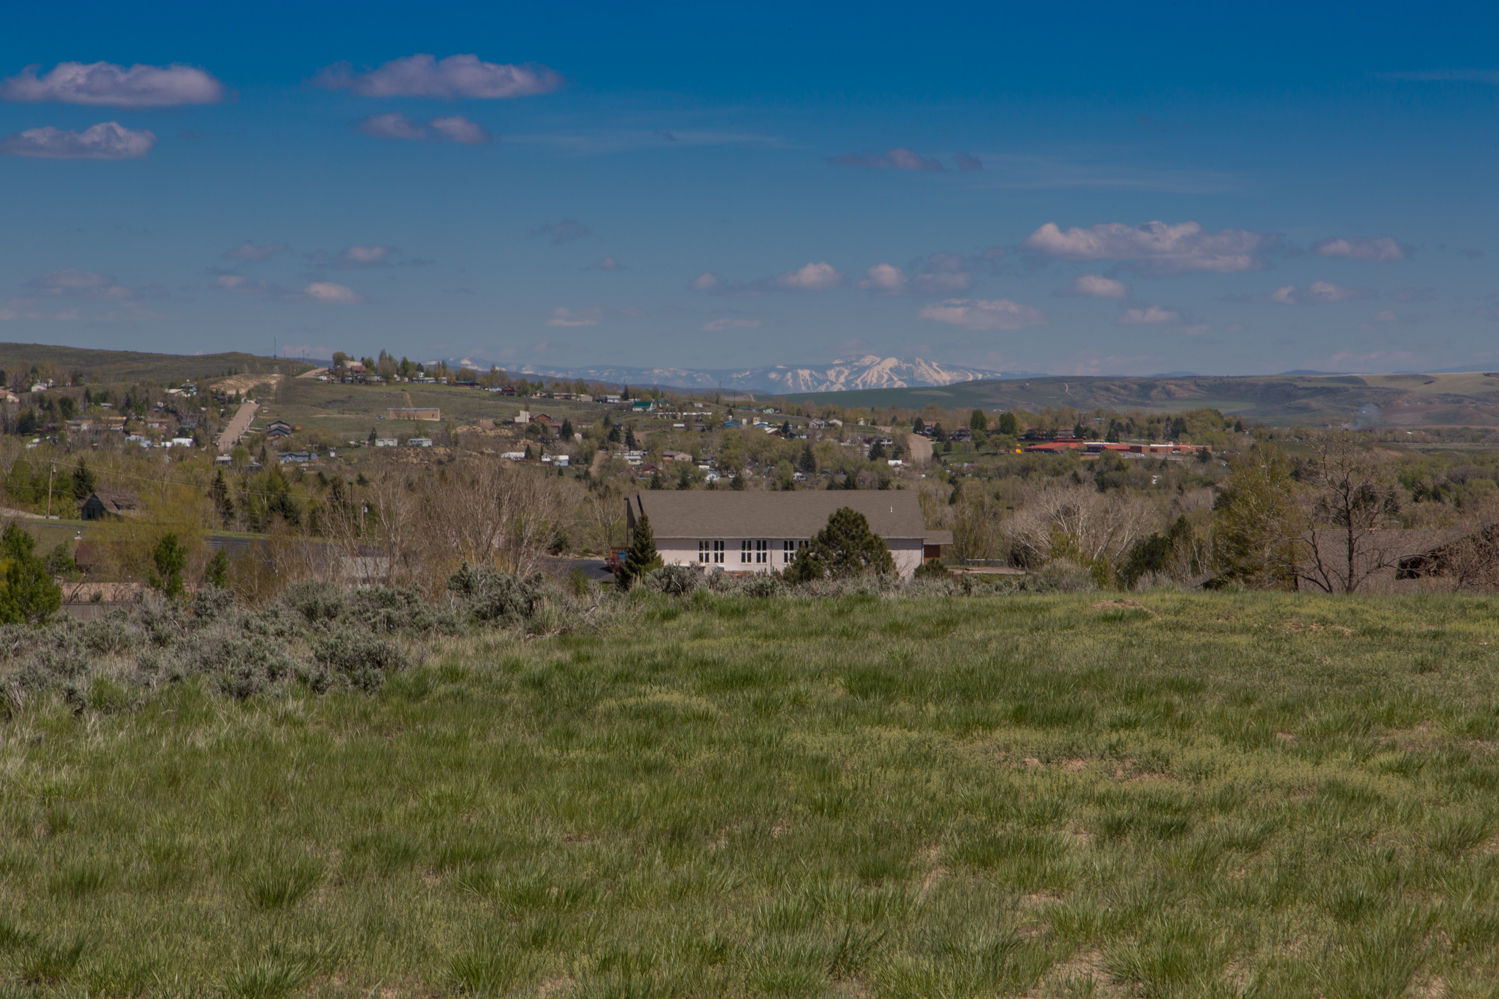 land for sale in craig, colorado, housing development, neighborhood, urban development, pud, Craig real estate, homesites for sale, mt werner views,